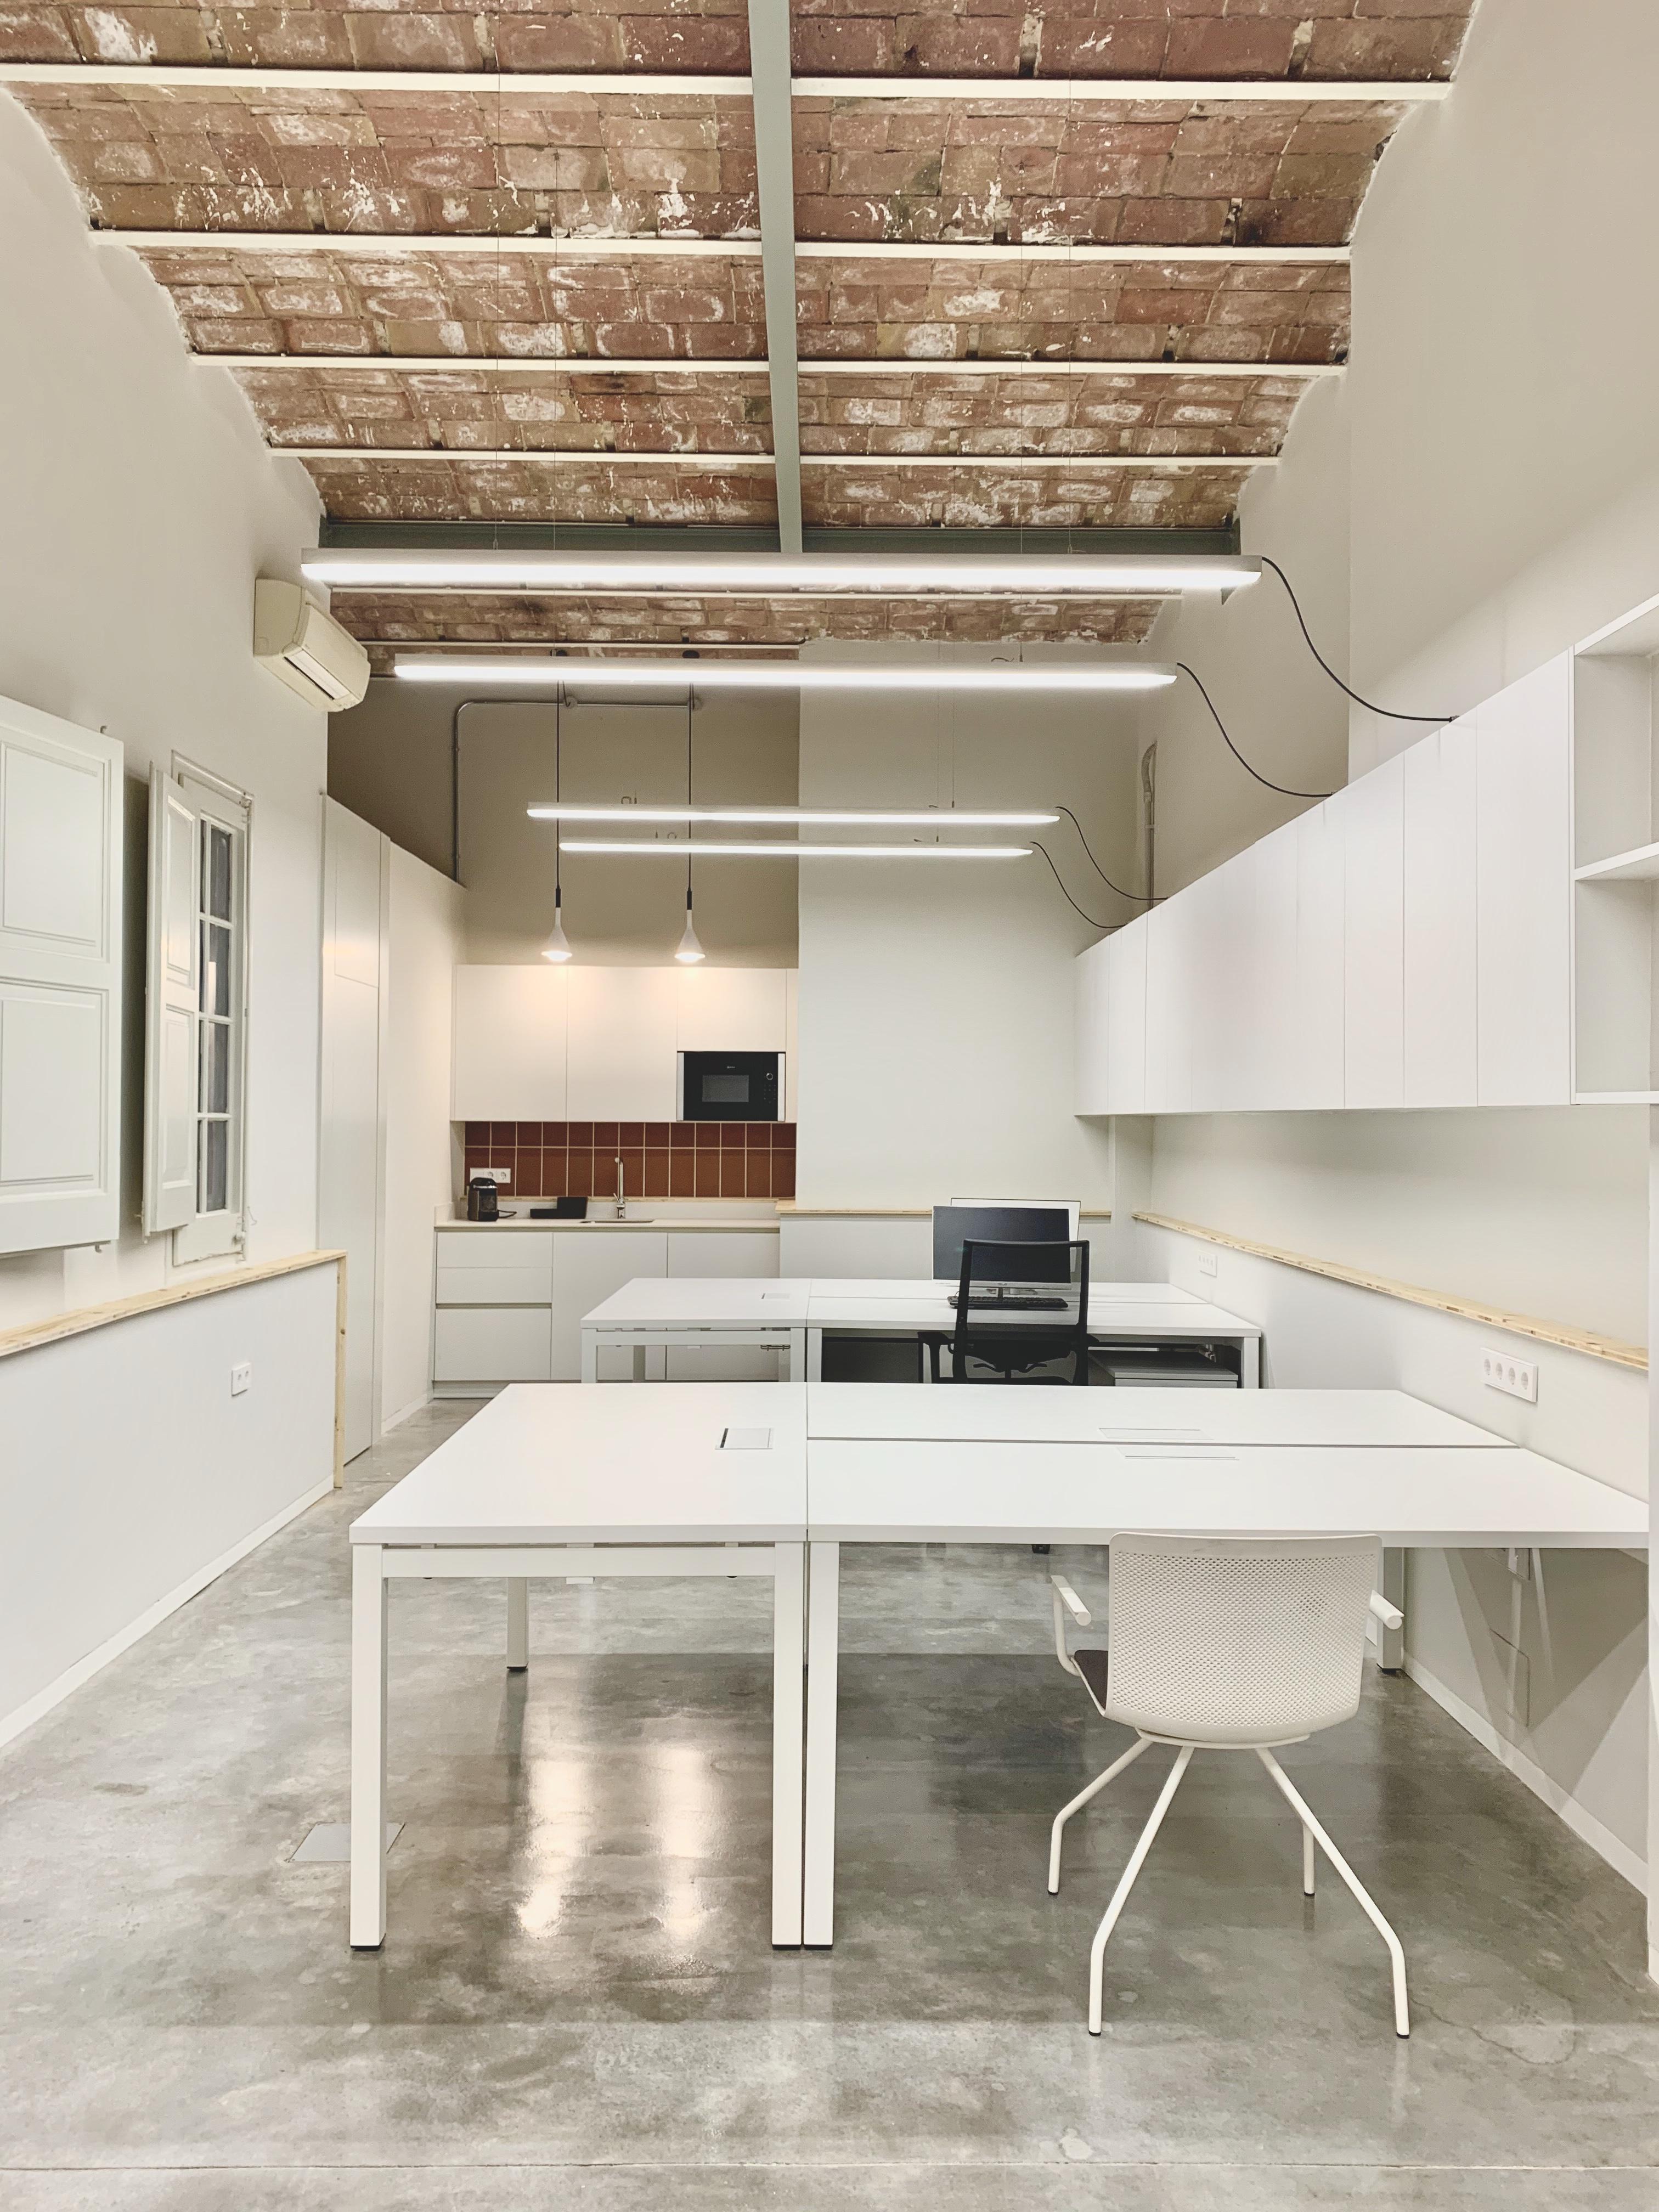 Arquivistes office 1